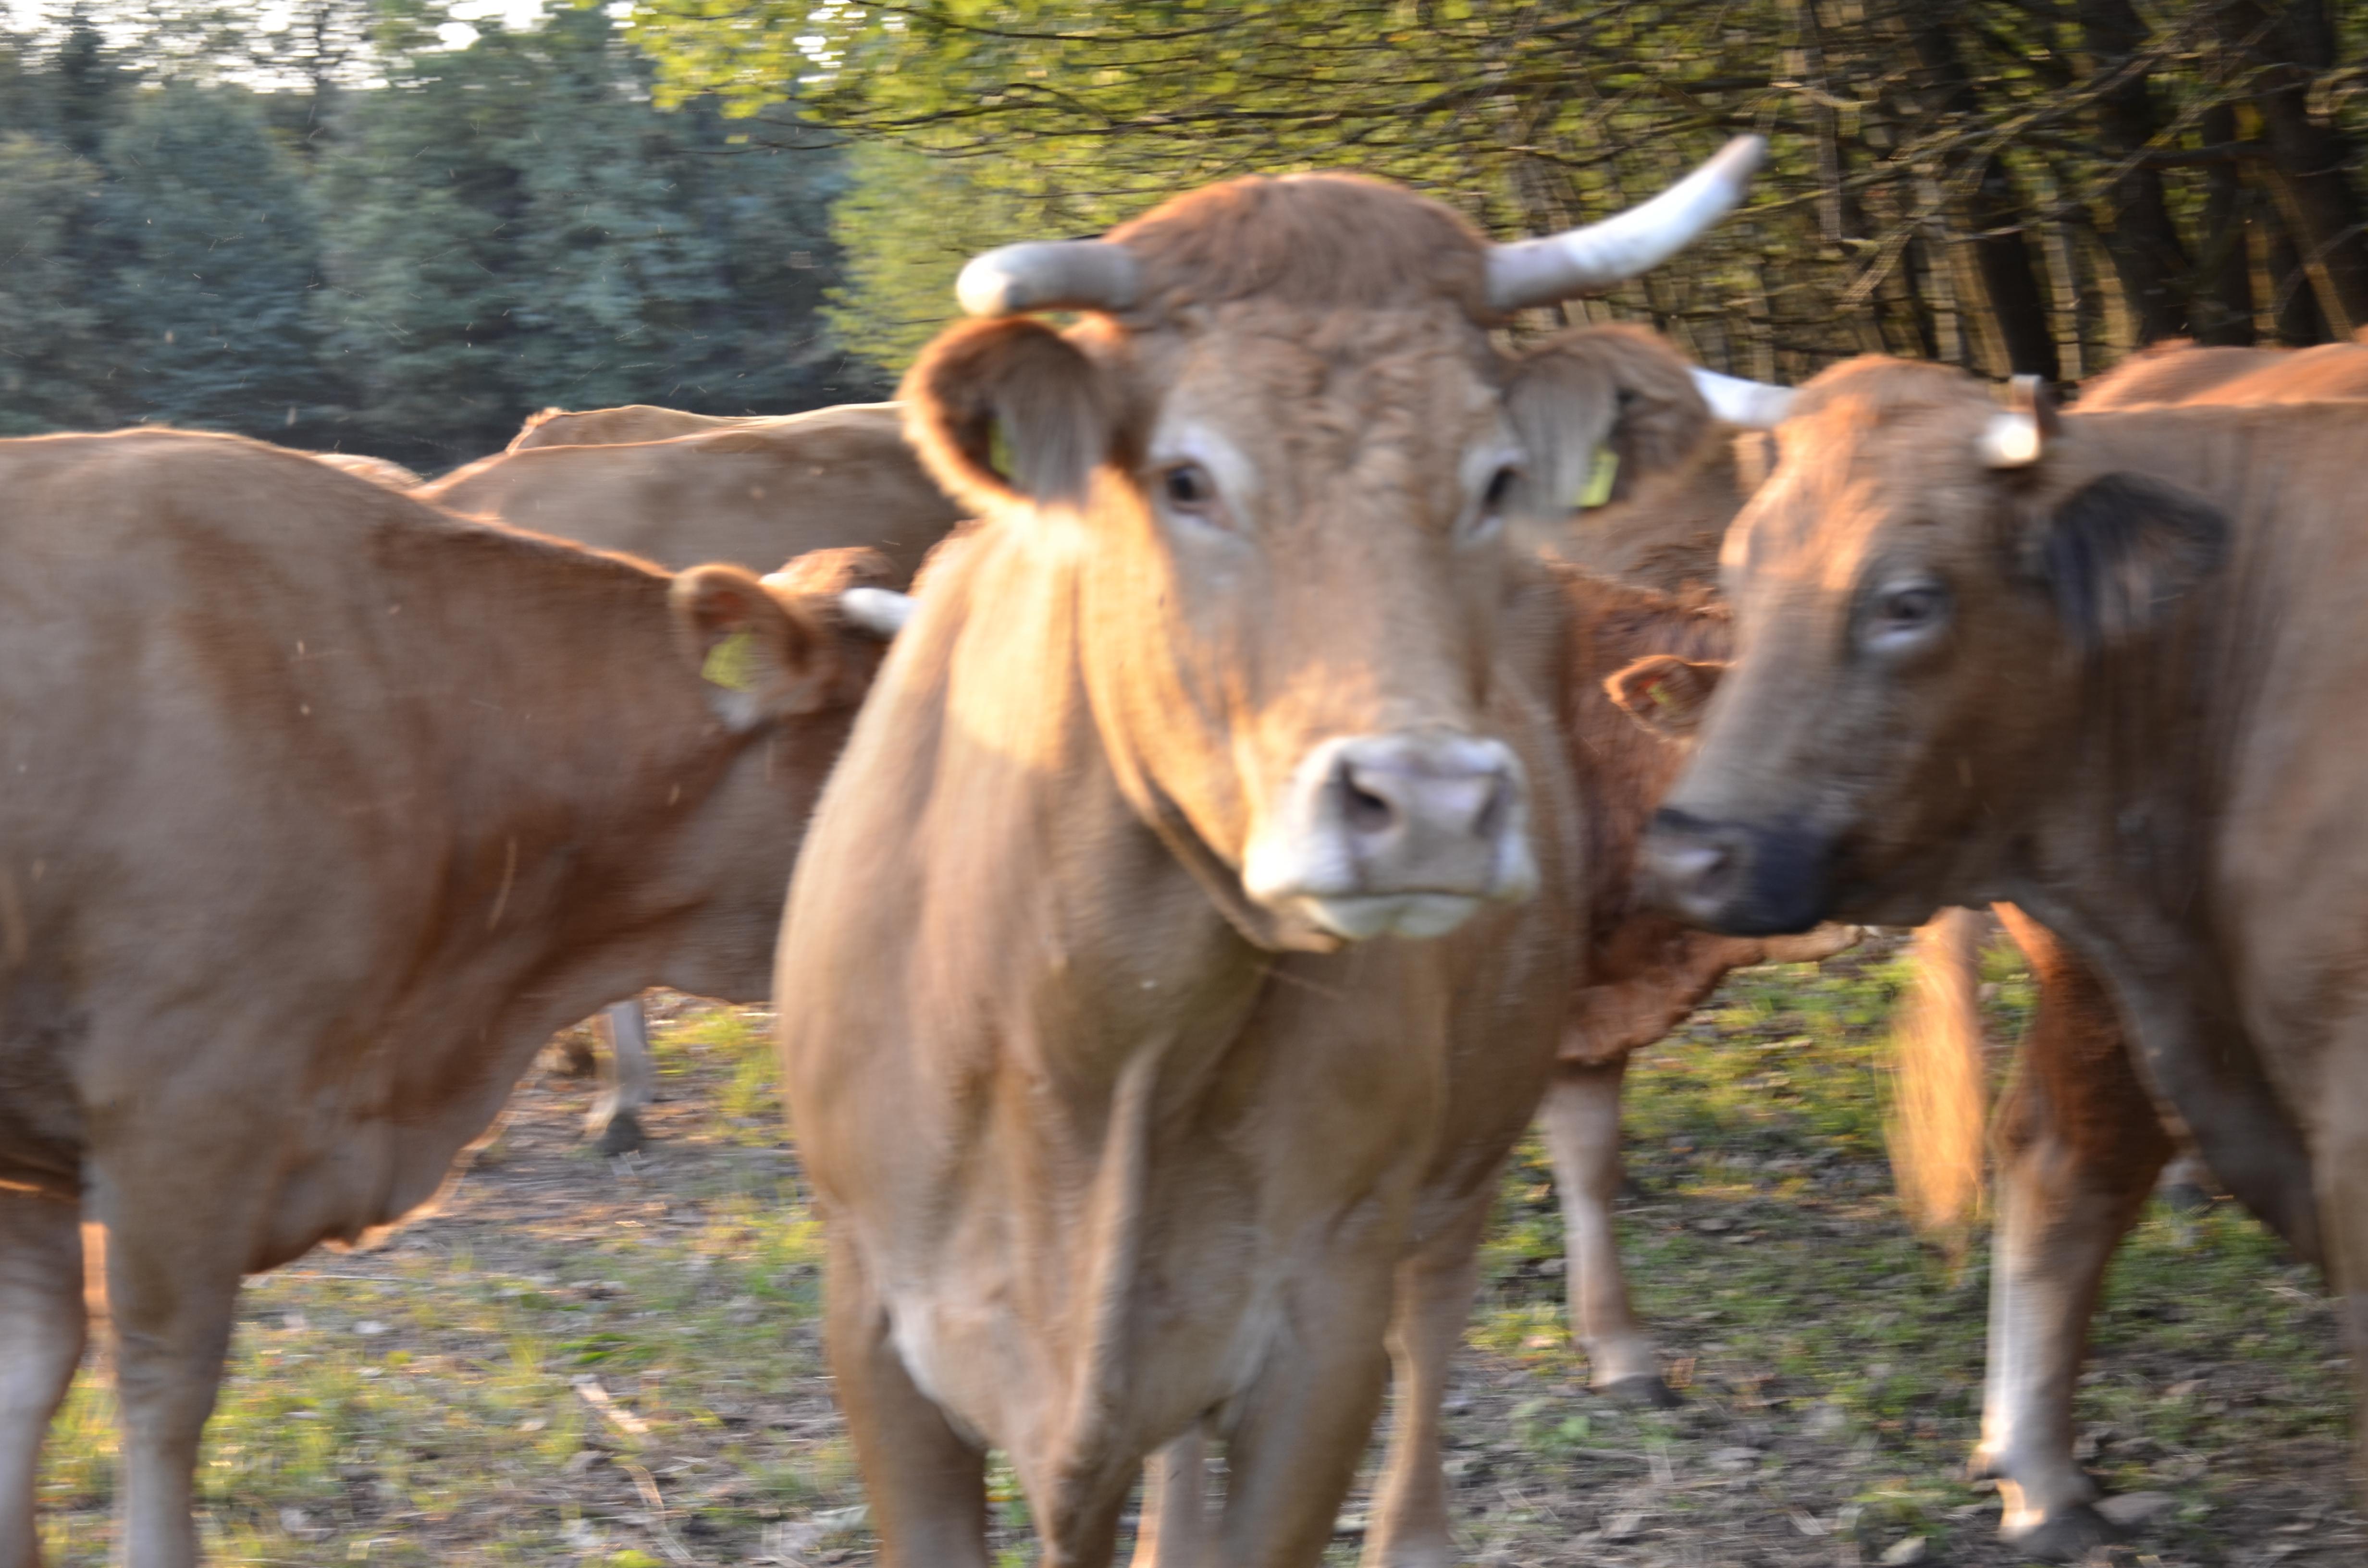 Rinder in Grunbach